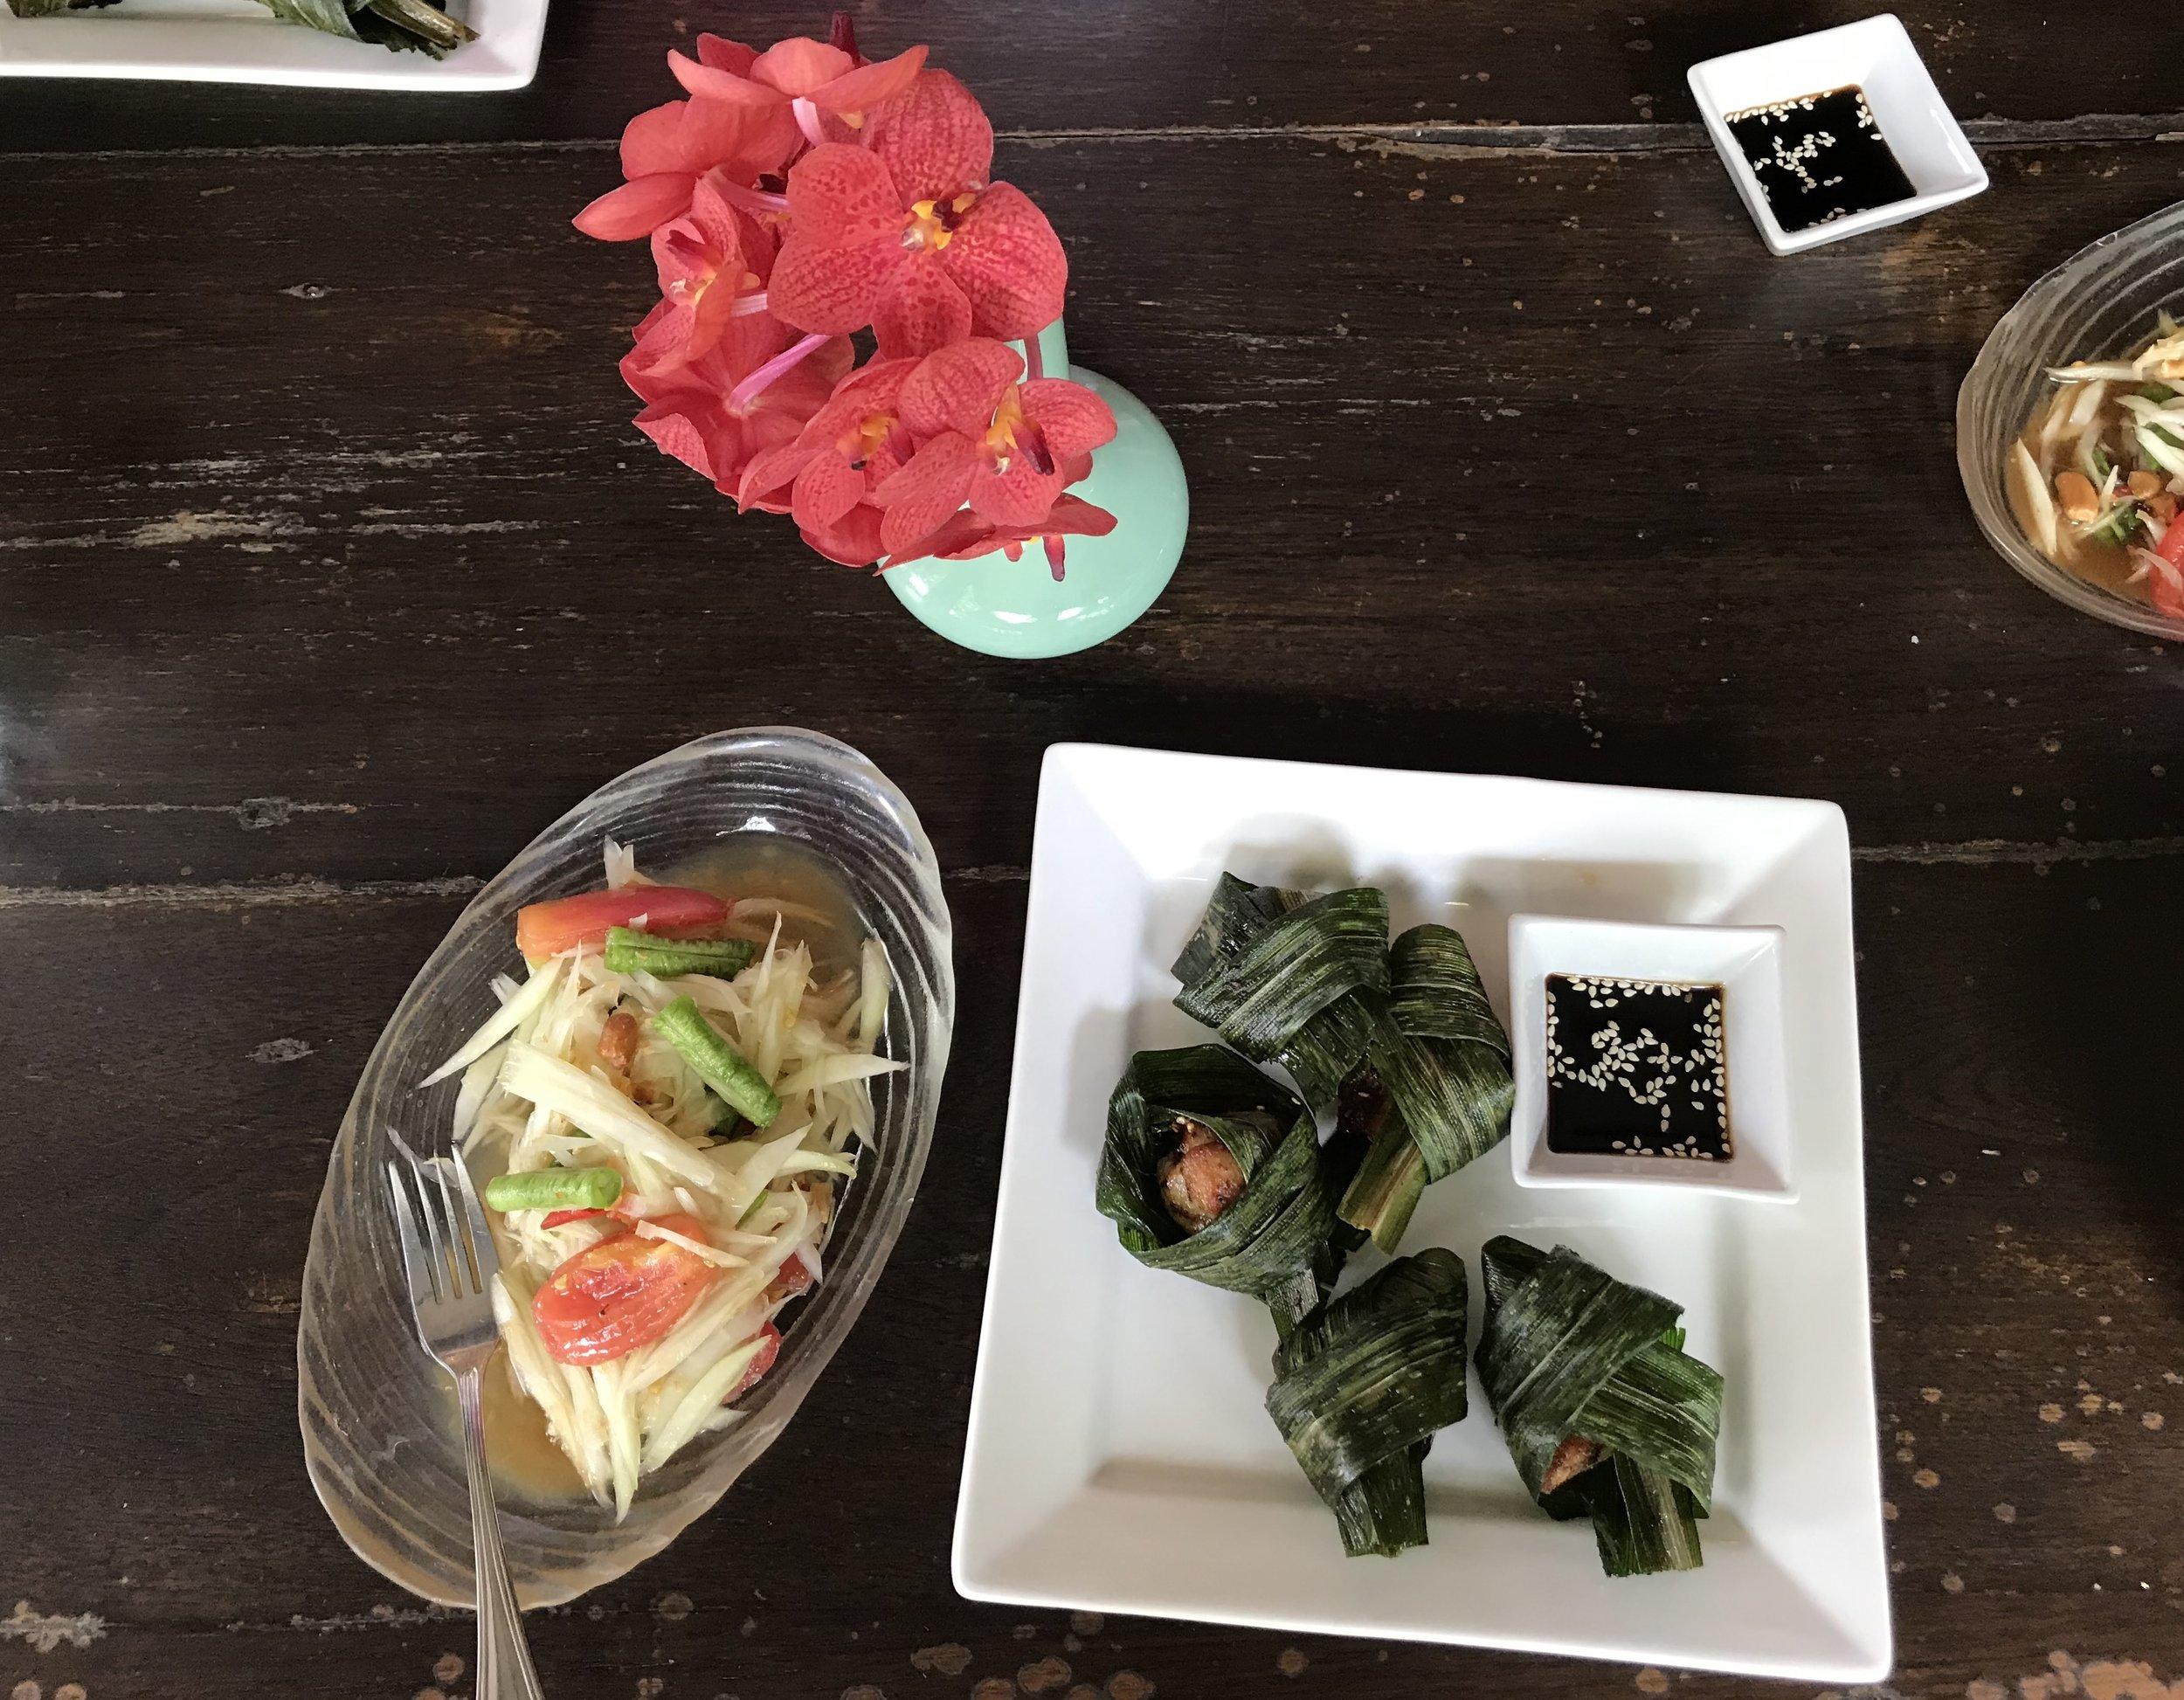 baipai school-cooking-class-dish-01.JPG